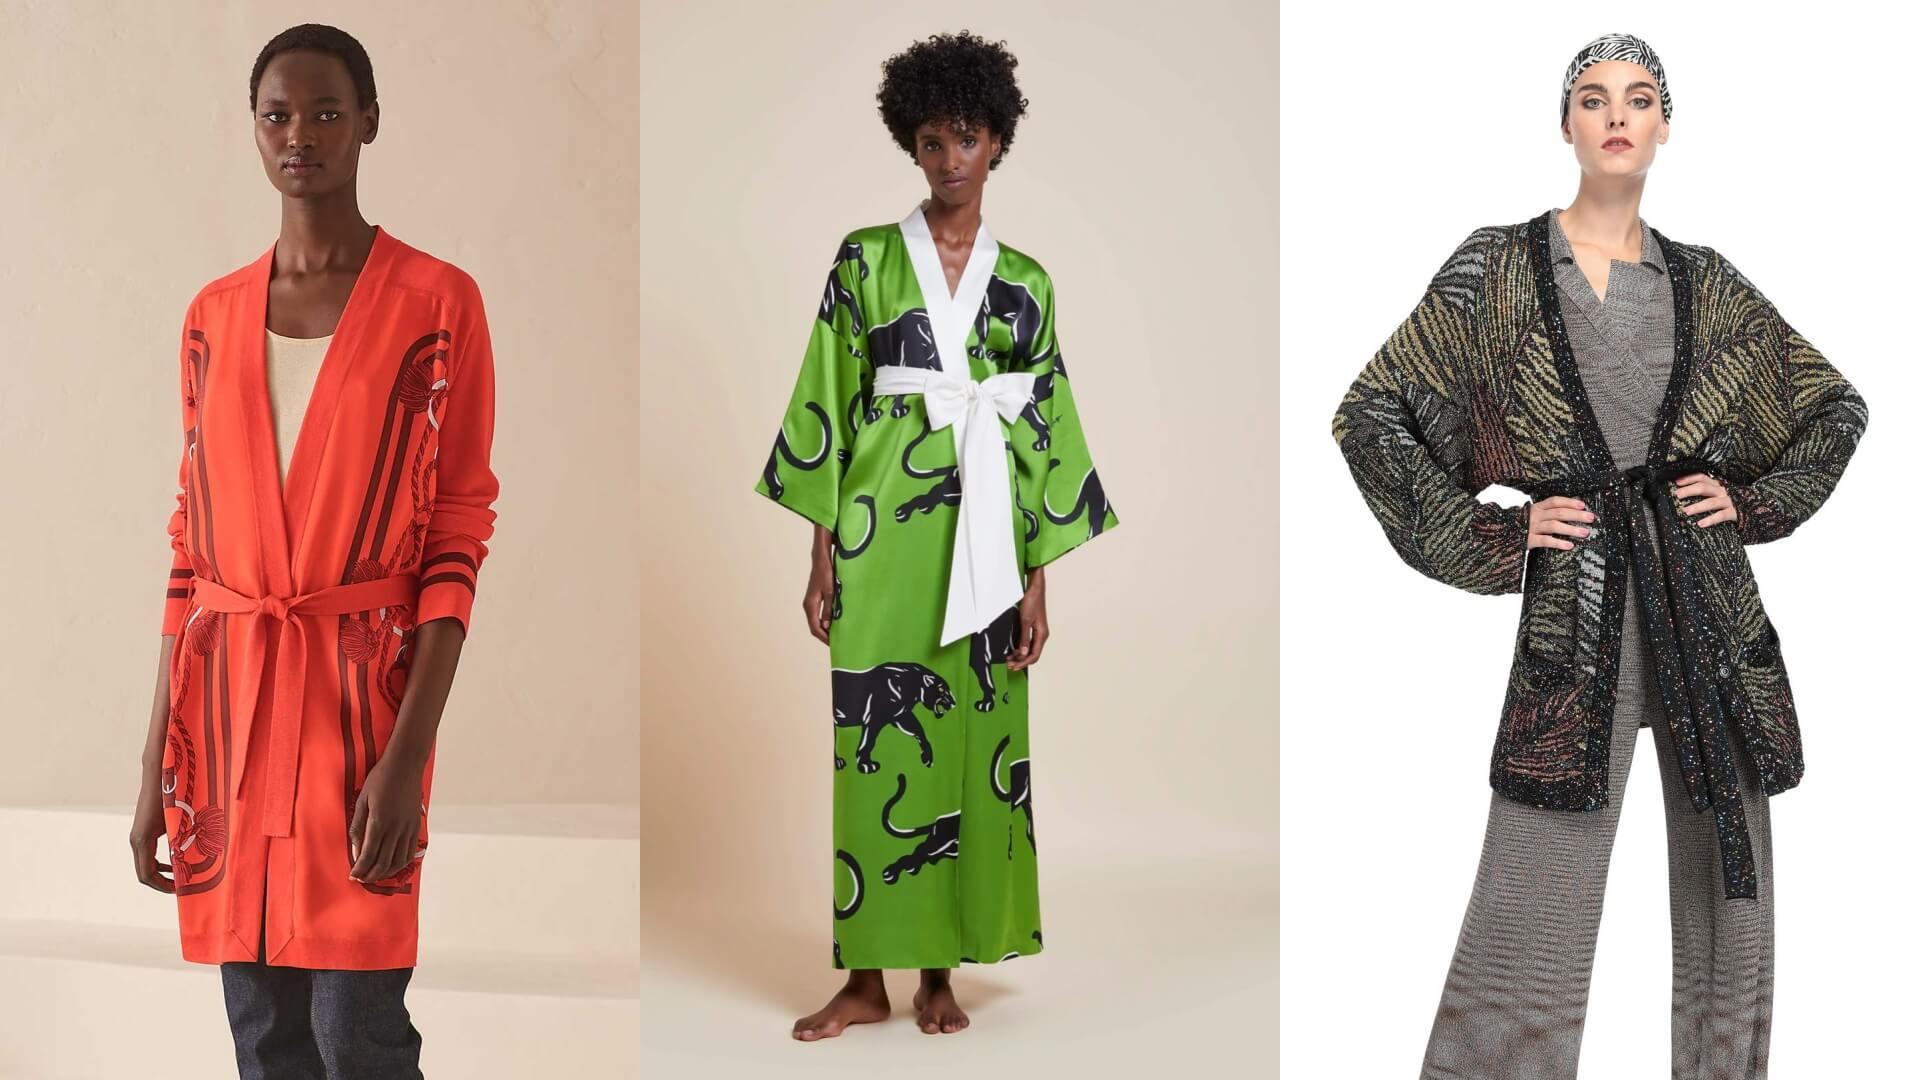 左起:Hermès($26,000)、Olivia von Halle($7,200)、Missoni($29,090)